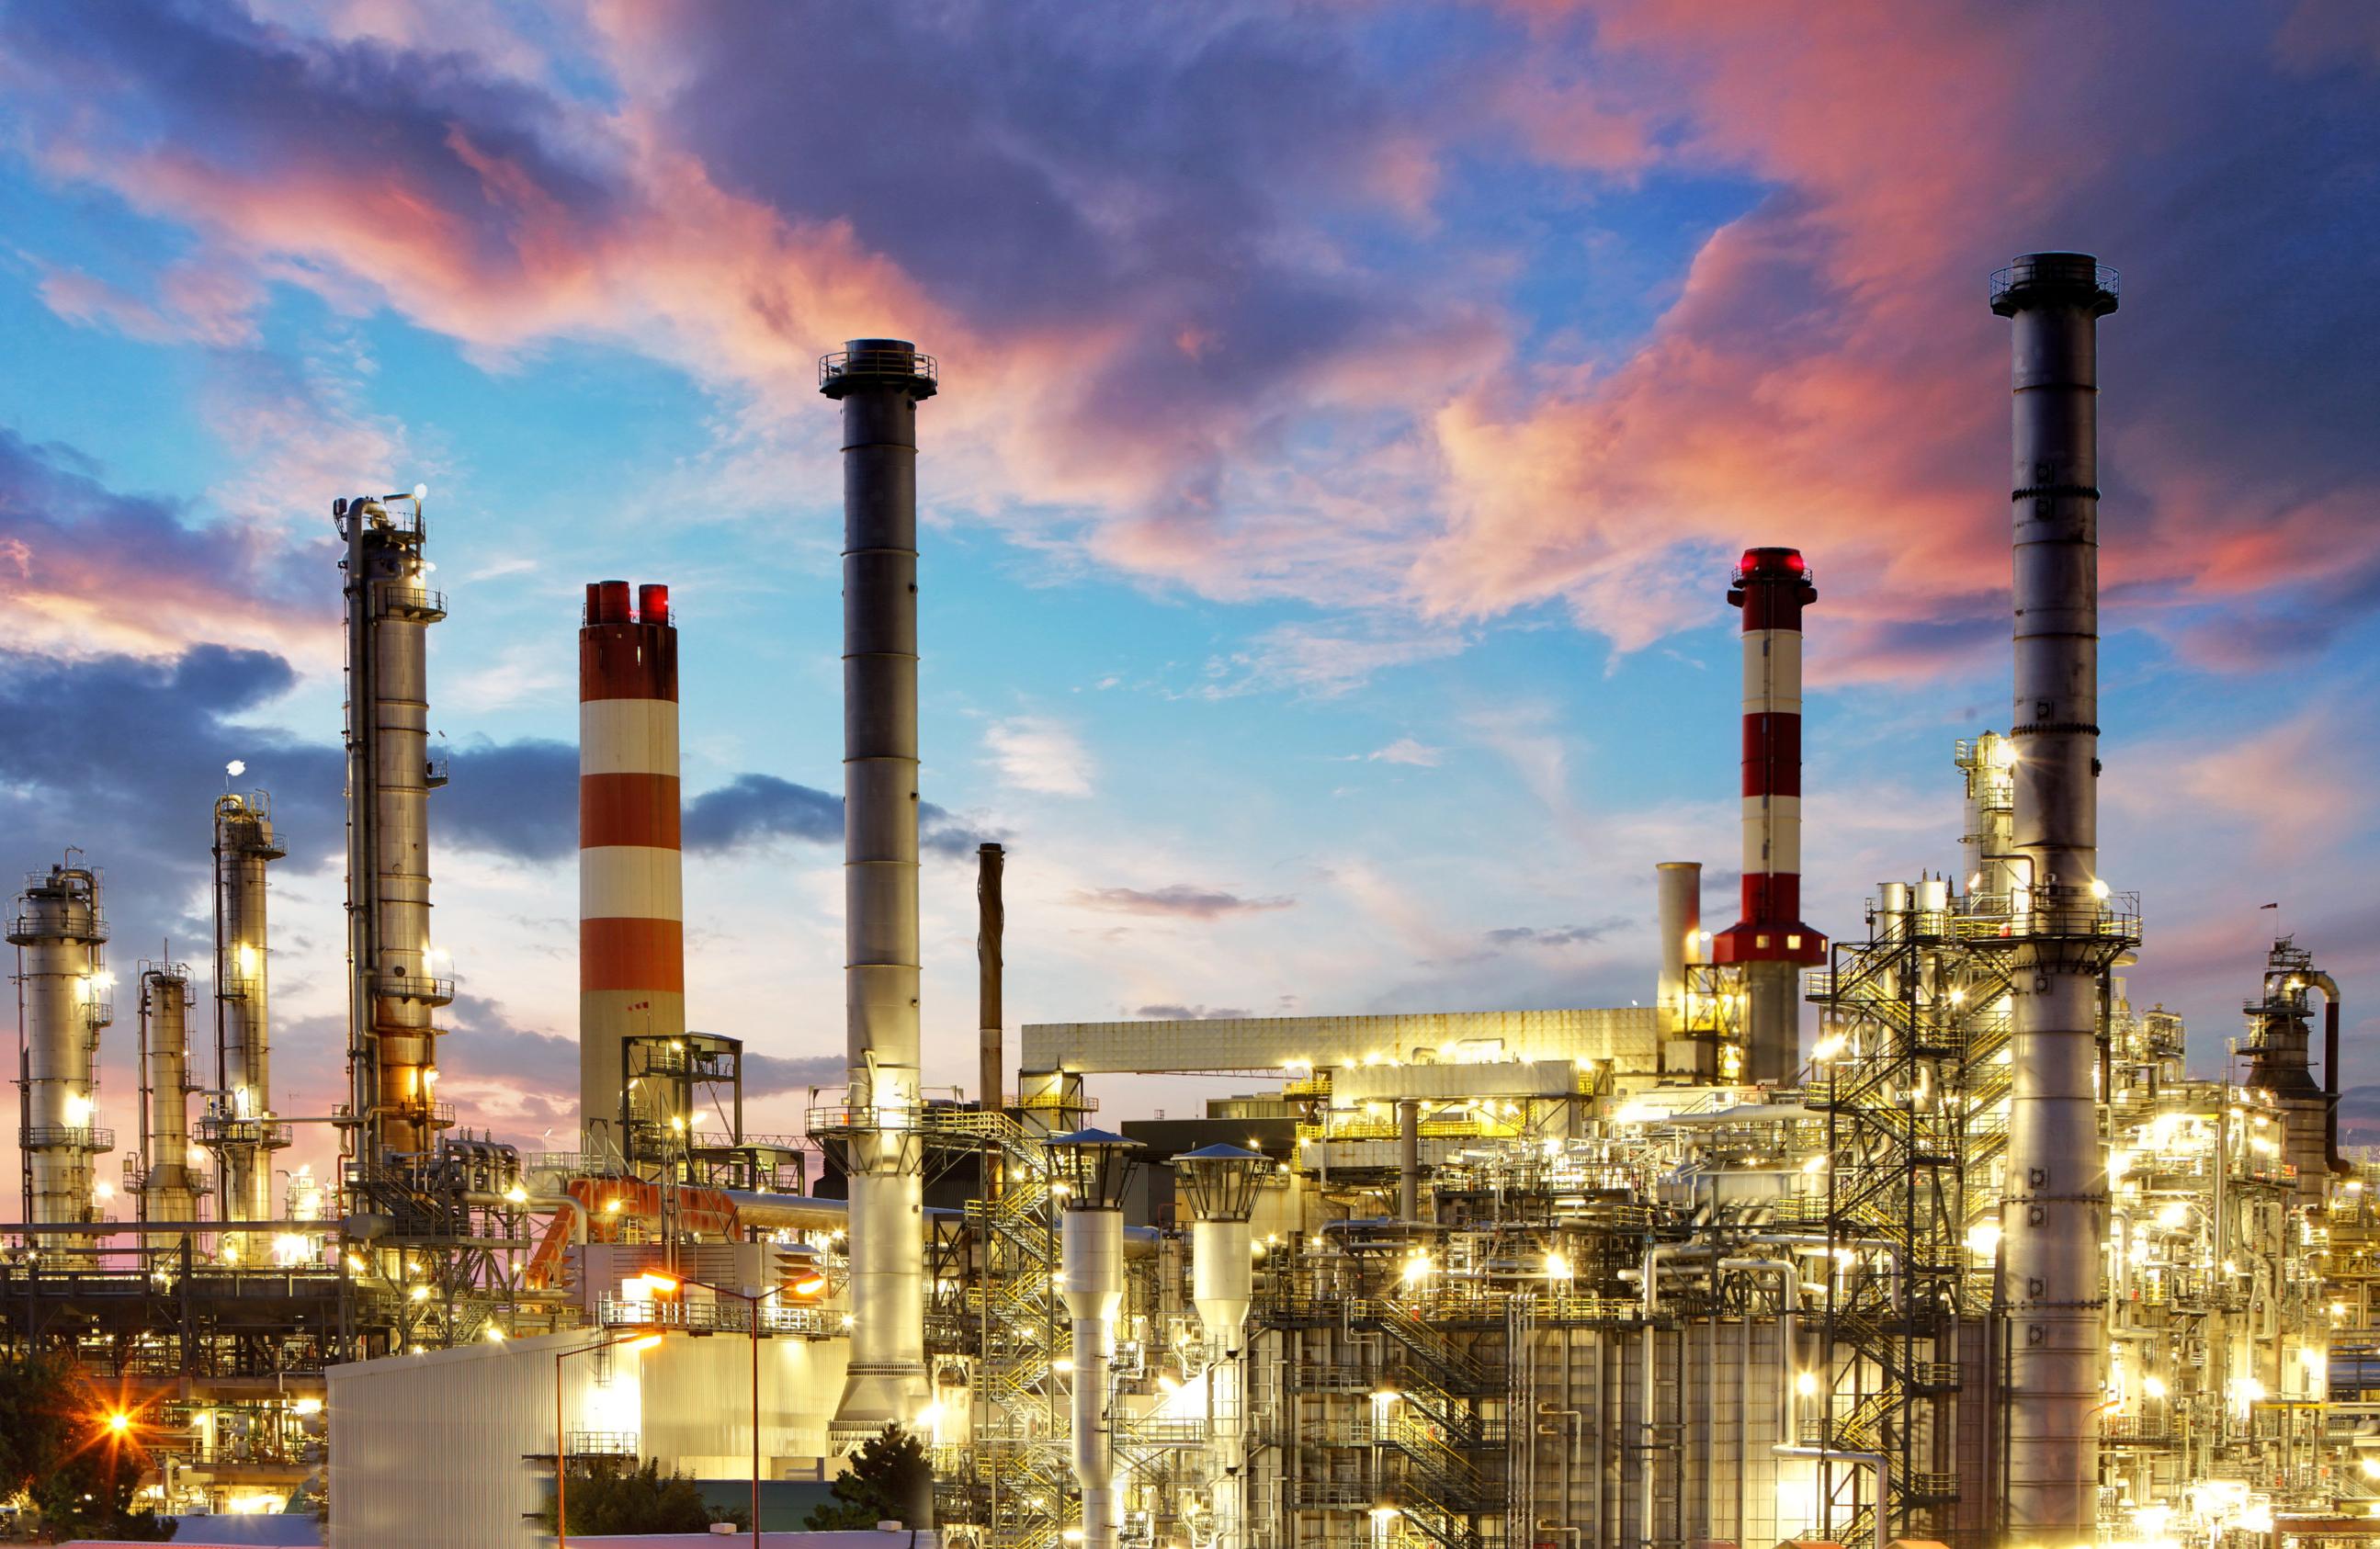 Carmel Engineering - Oil & Gas Refinery